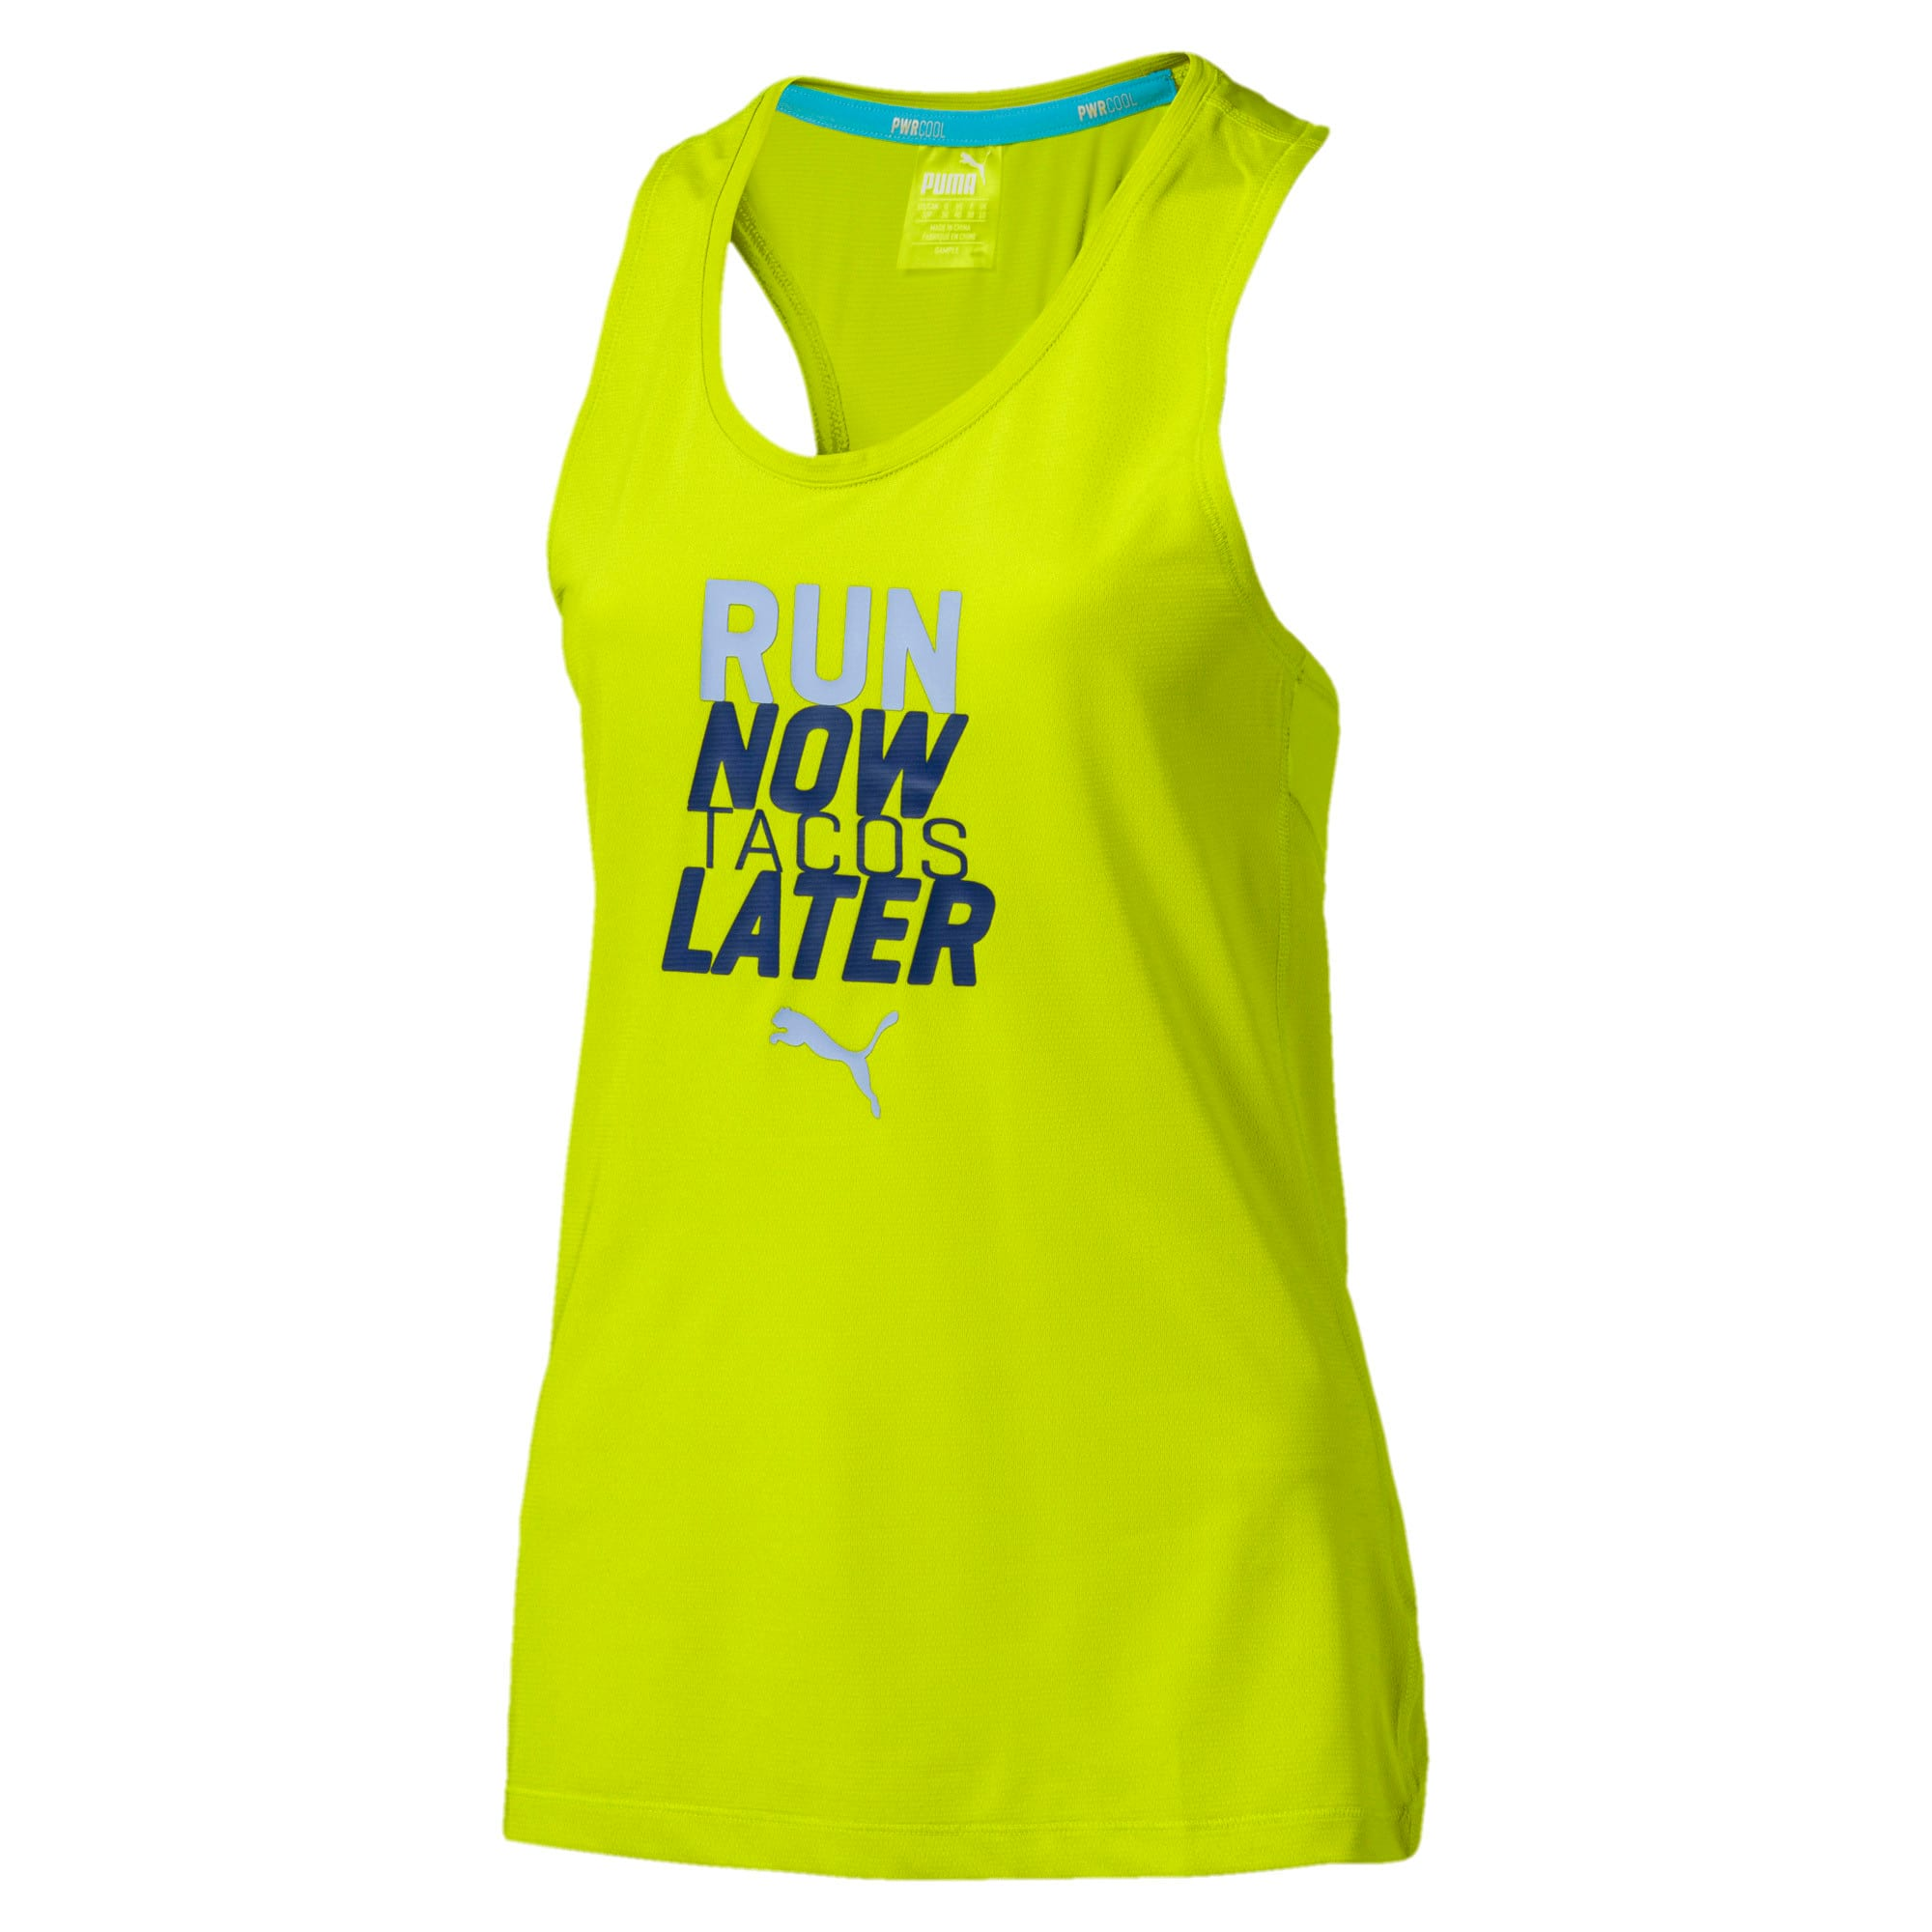 Thumbnail 3 of Running Women's PWRCOOL Slogan Tank Top, Nrgy Yellow, medium-IND